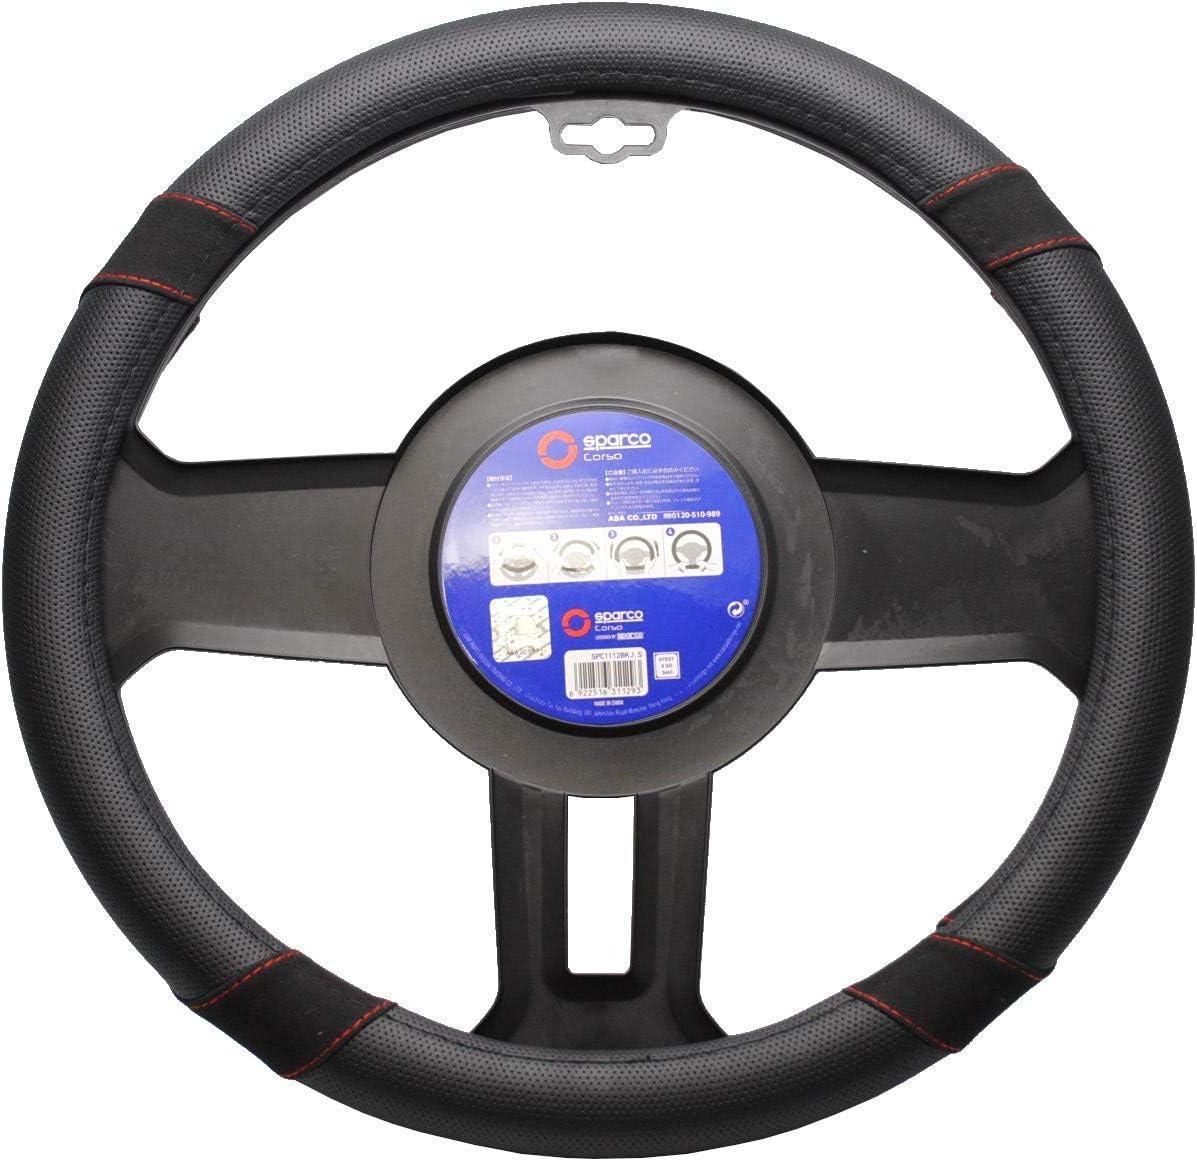 Black Steering Wheel Cover in Imitation Suede